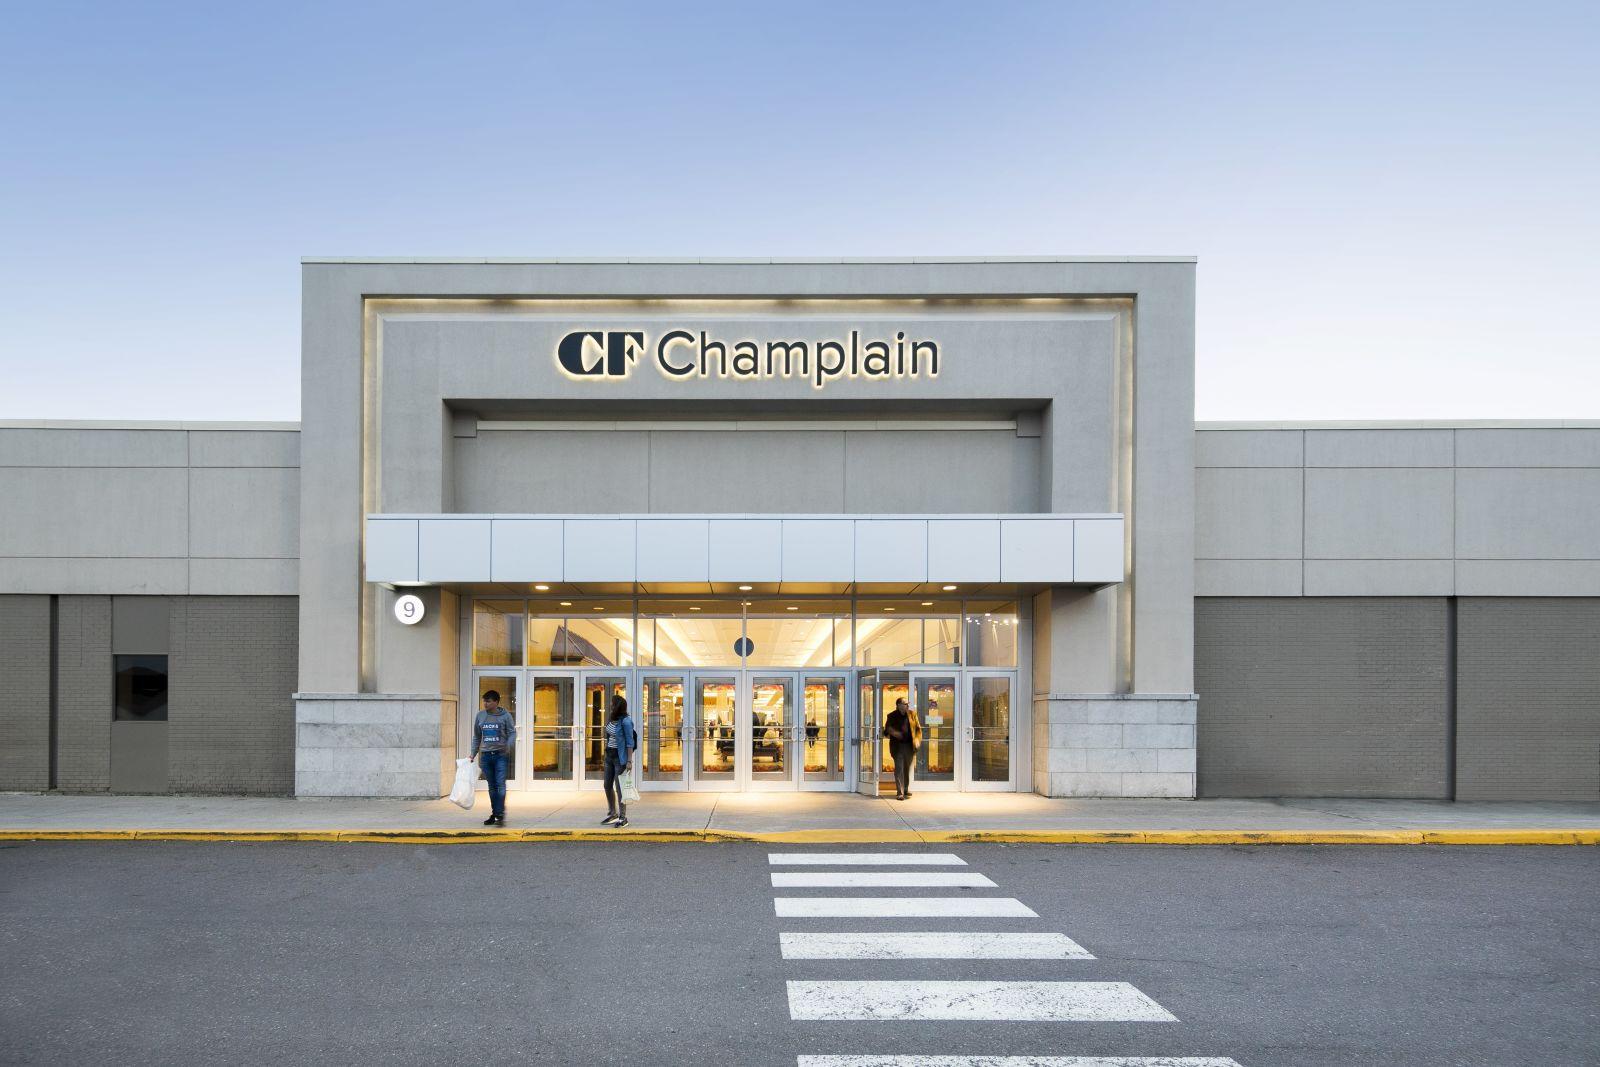 [CF Champlain] Opengraph